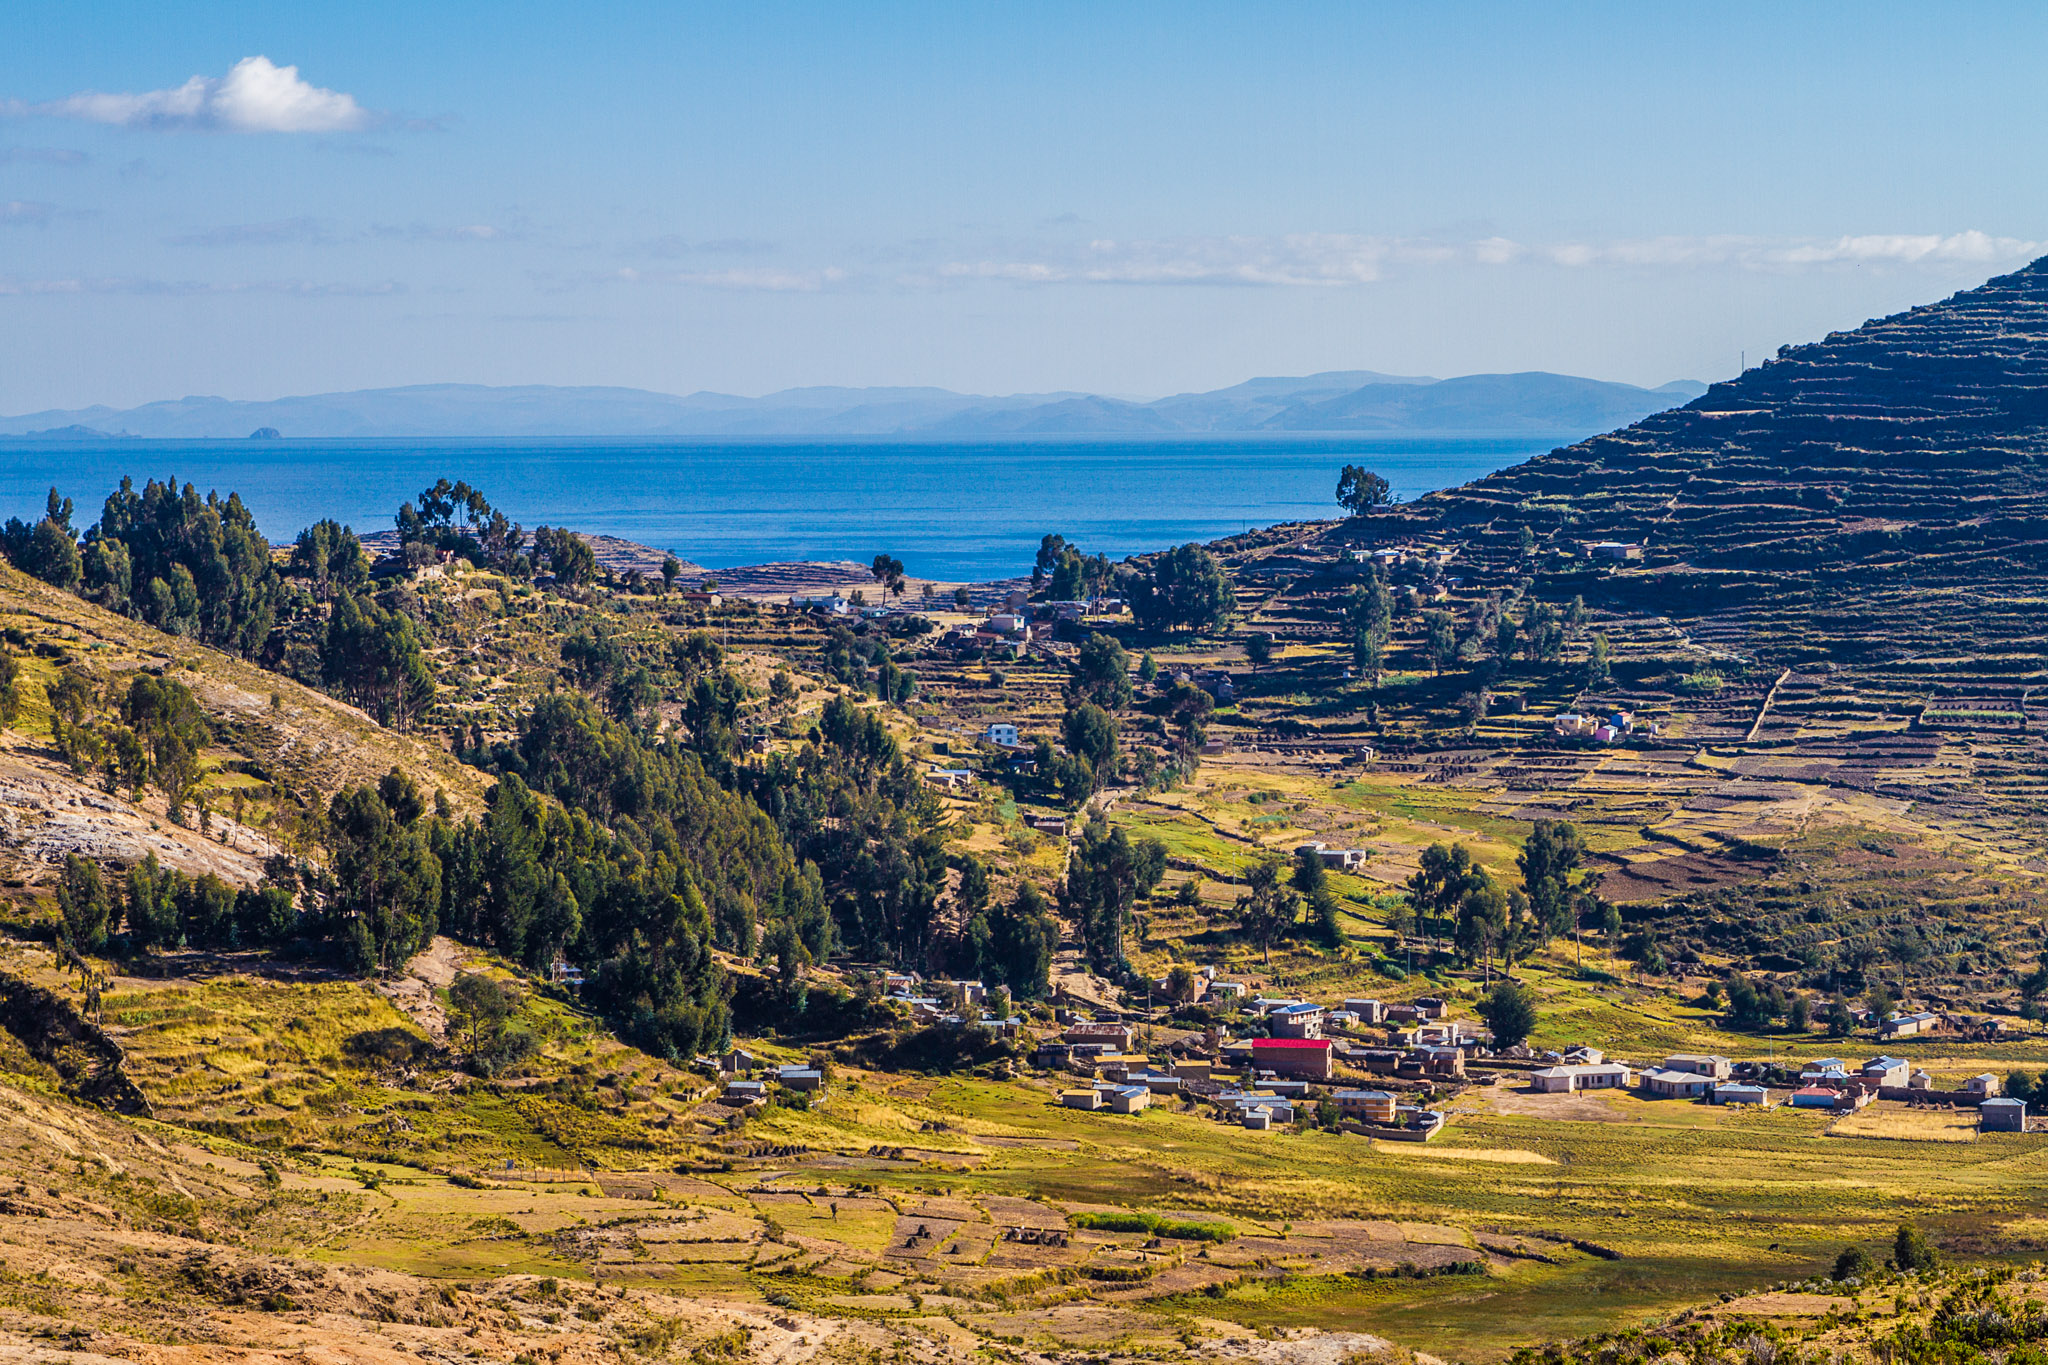 Ali-Barqawi-Studios-Explore-Series-Travel-Adventure-Documentary-C4CGAZA-Bolivia-Lake-Titicaca-2015-055.jpg